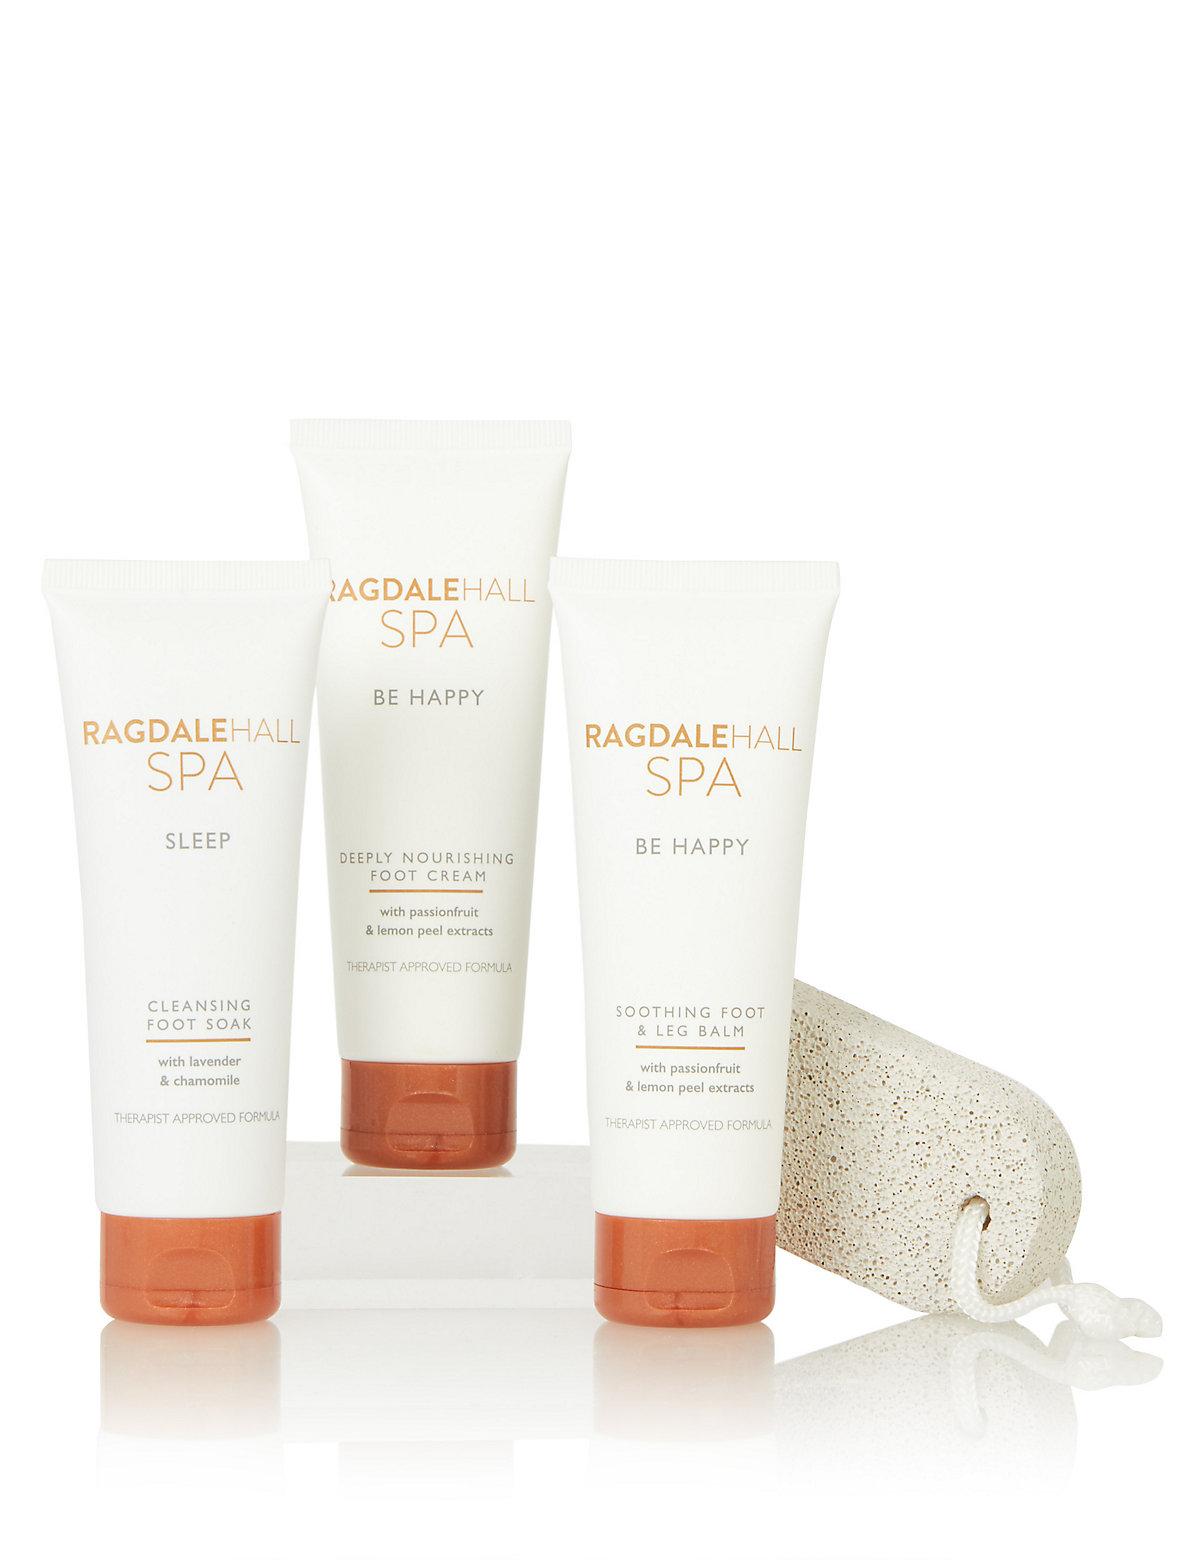 Ragdale Hall Foot Spa Gift Set